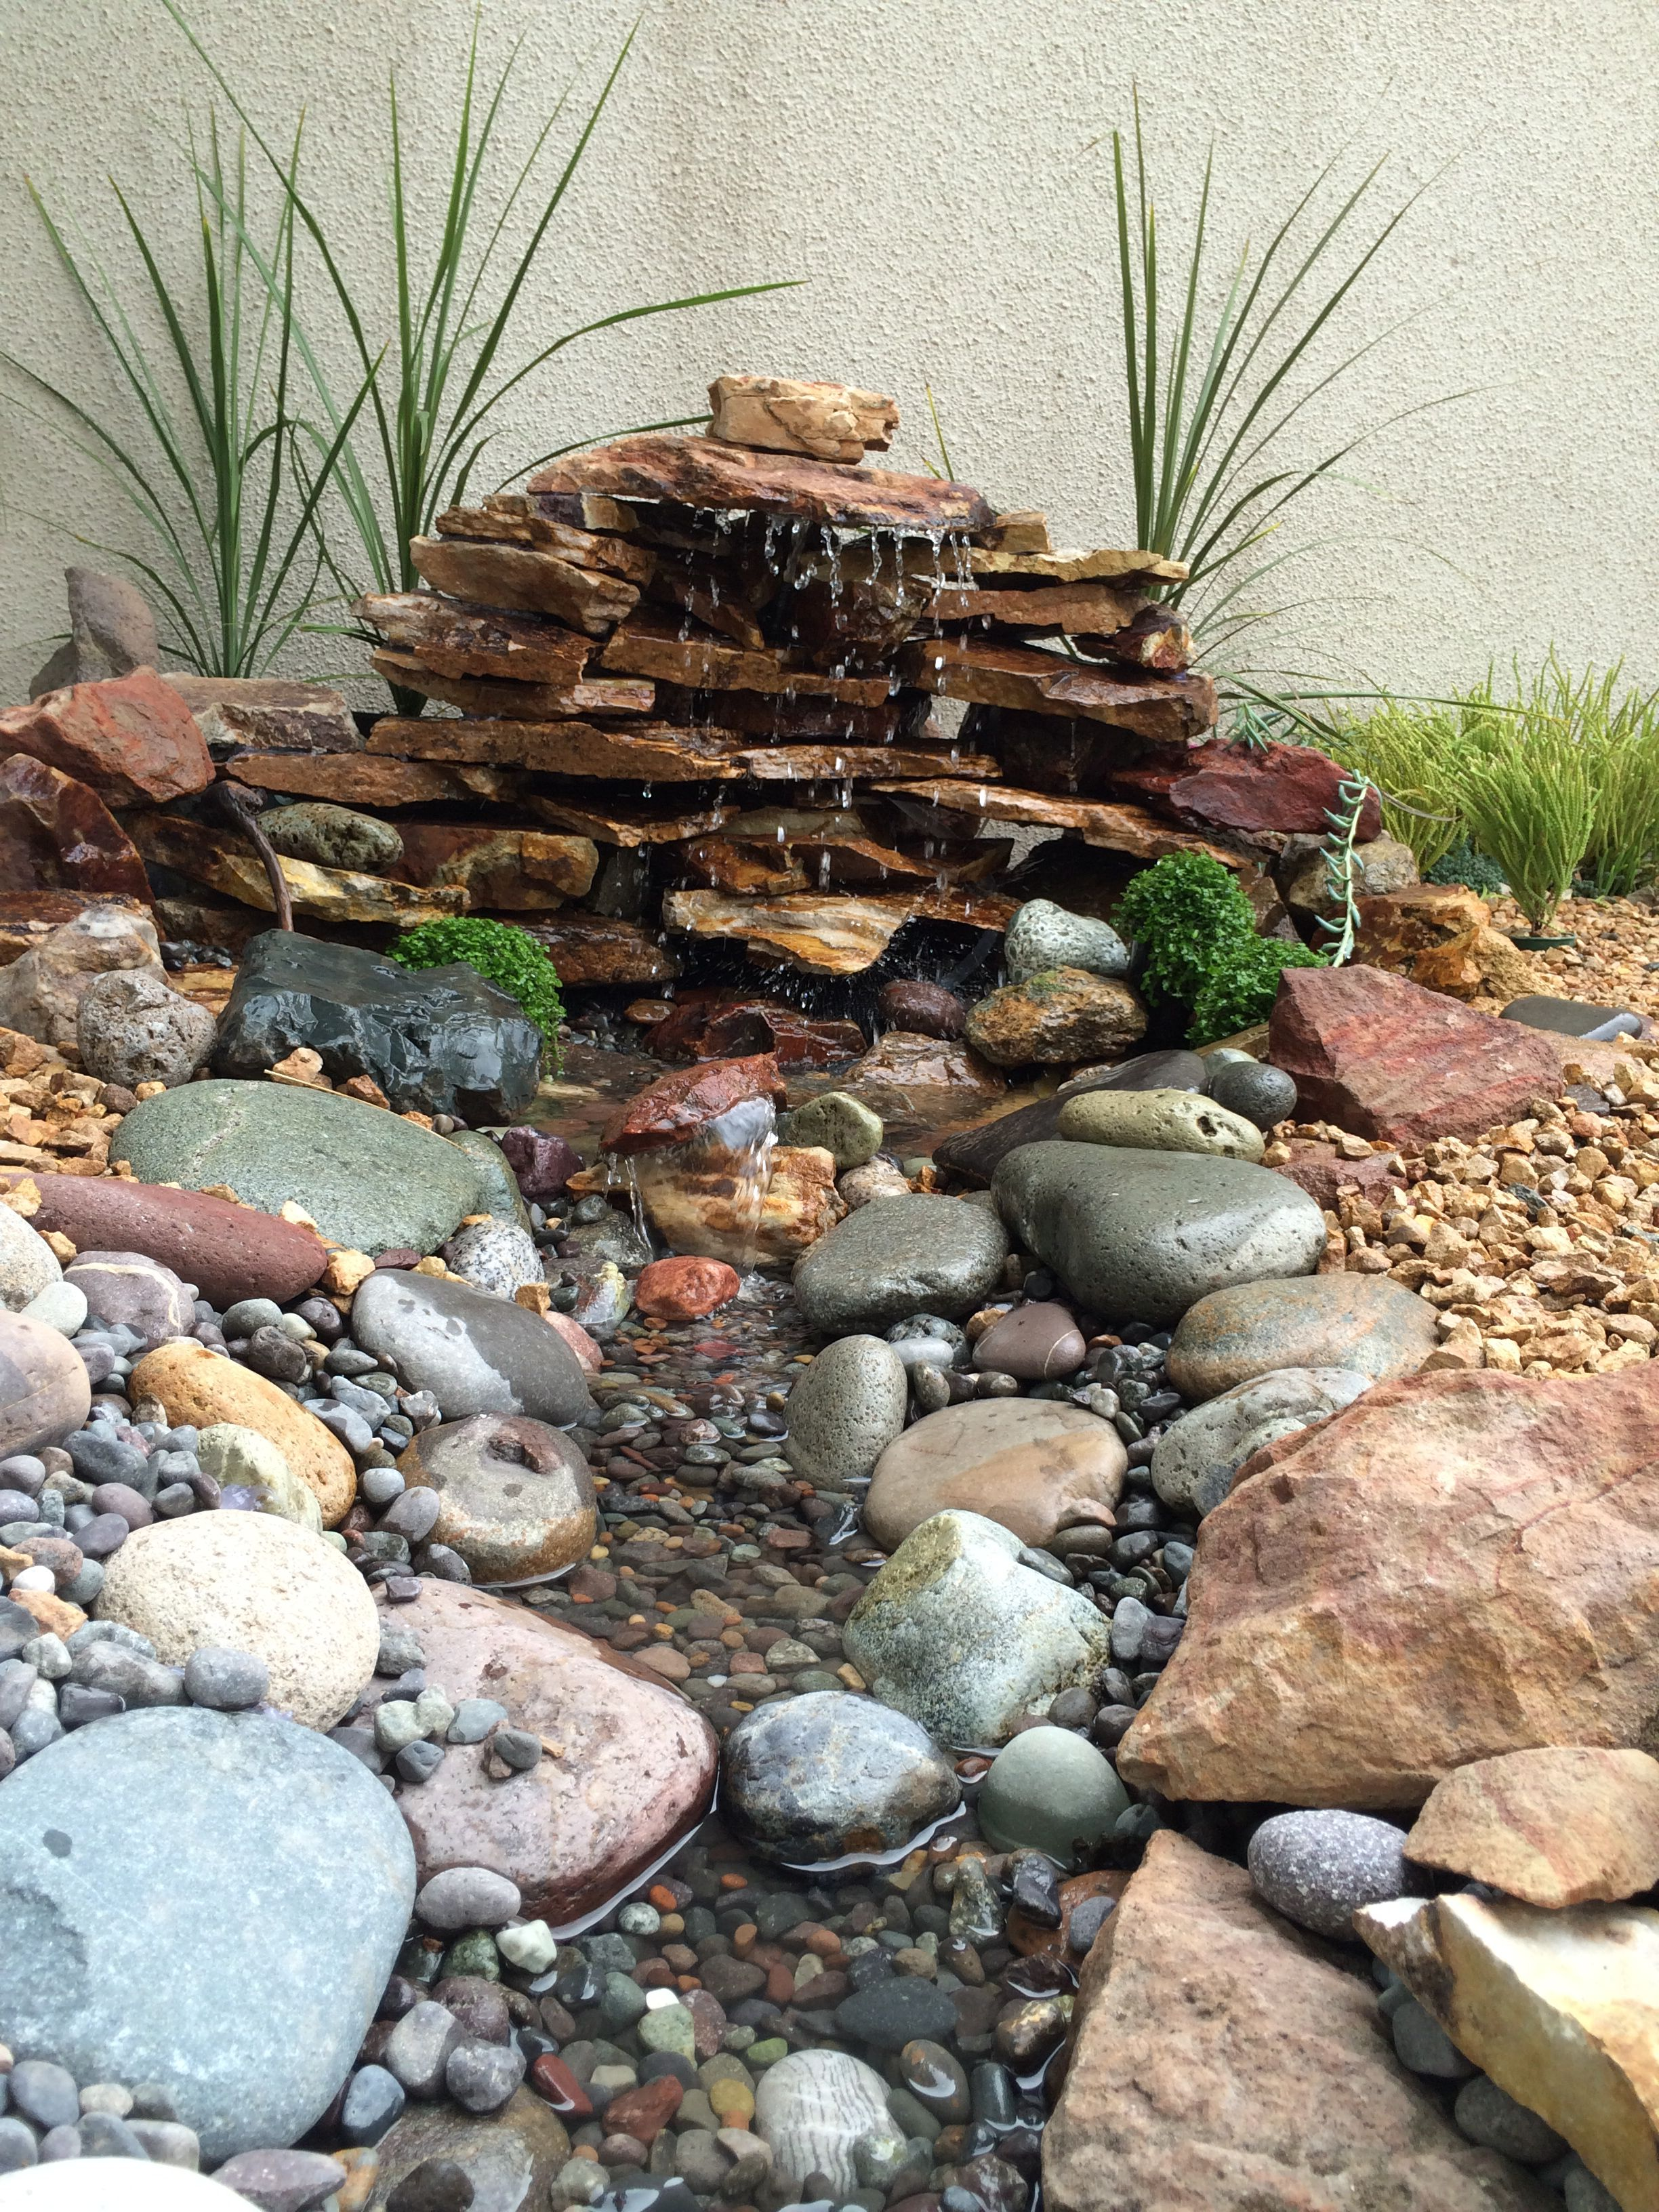 Fuentes de jardin caseras fuentes de jardn artesanal for Cascada casera para jardin